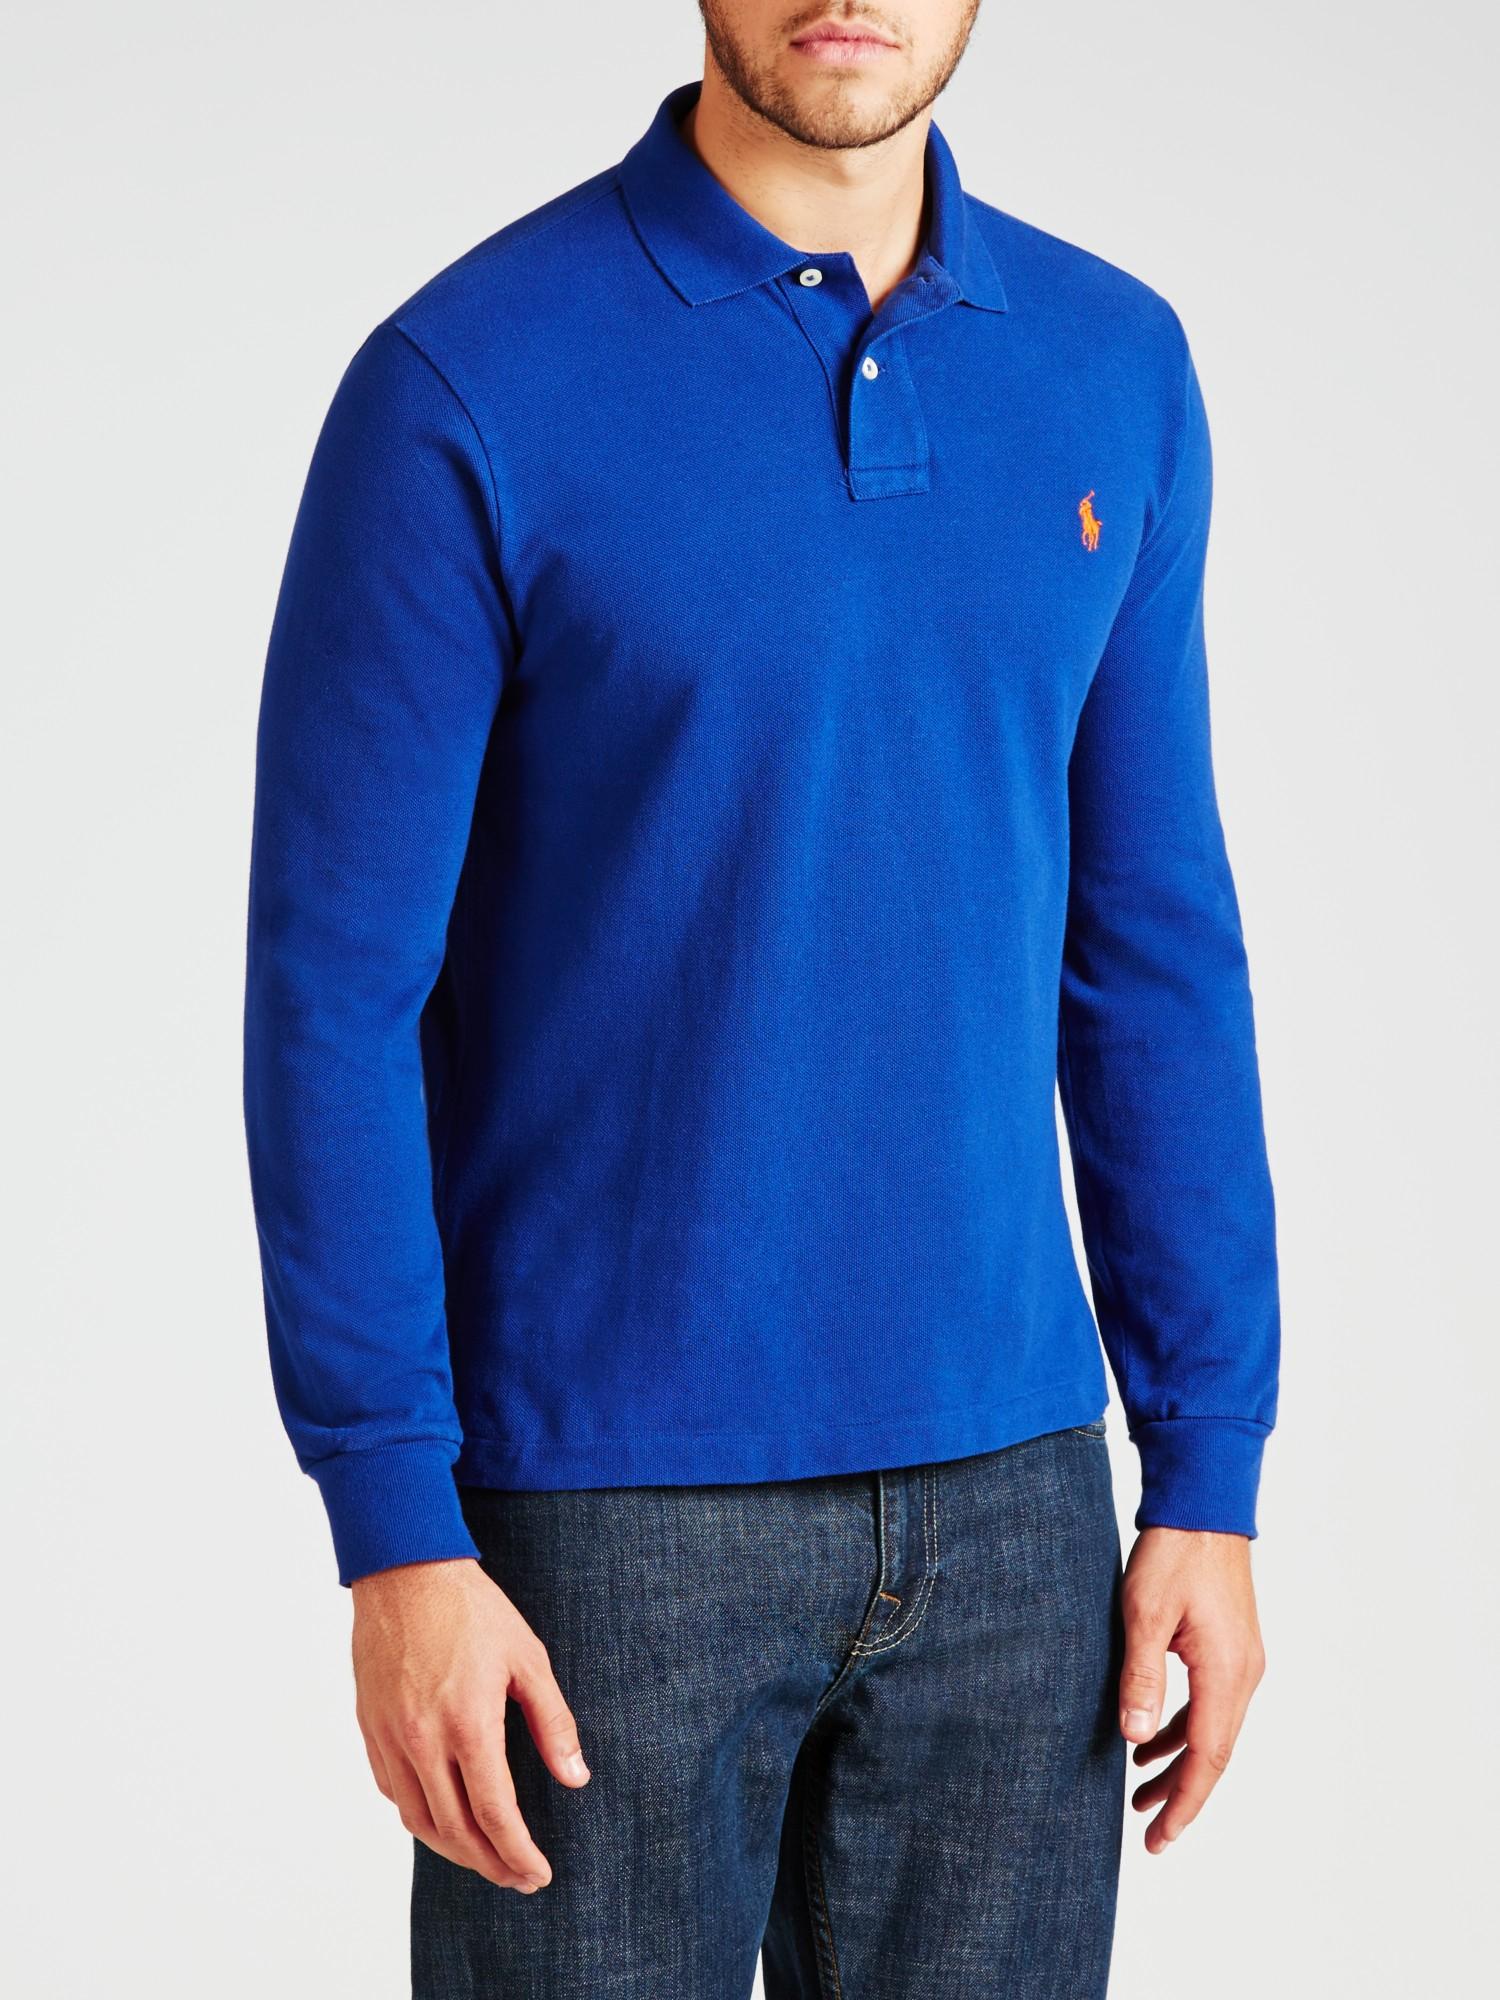 a2599b68 Polo Ralph Lauren Custom Fit Long Sleeve Polo Shirt in Blue for Men ...